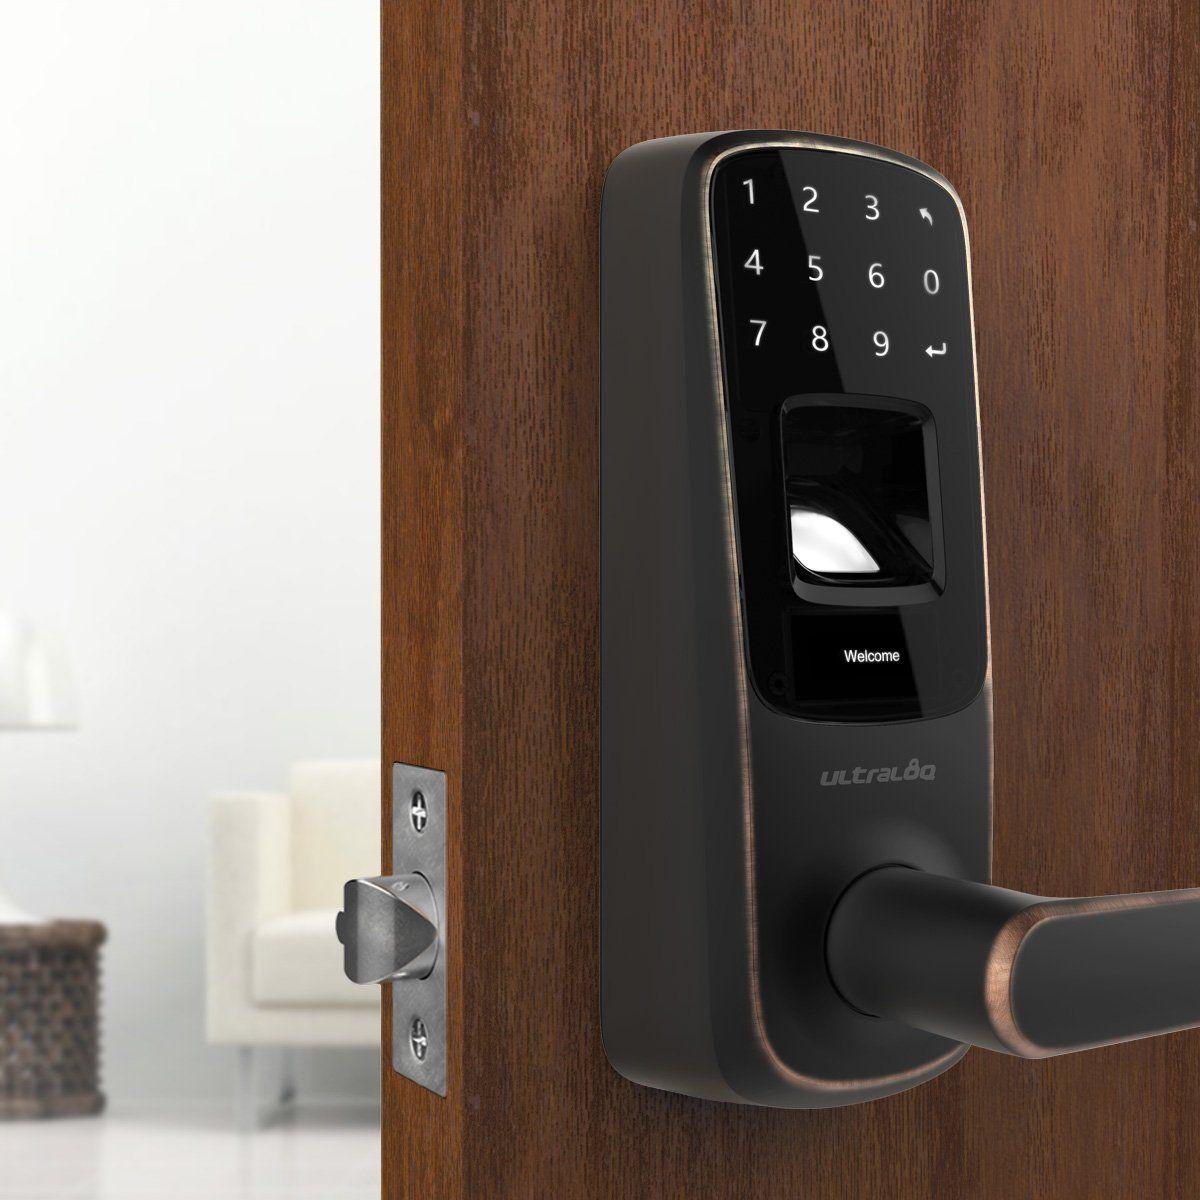 Ultraloq Ul3 Fingerprint And Touchscreen Keyless Smart Lever Door Lock Aged Bronze Visit The Image Link Fingerprint Door Lock Smart Door Locks Door Locks